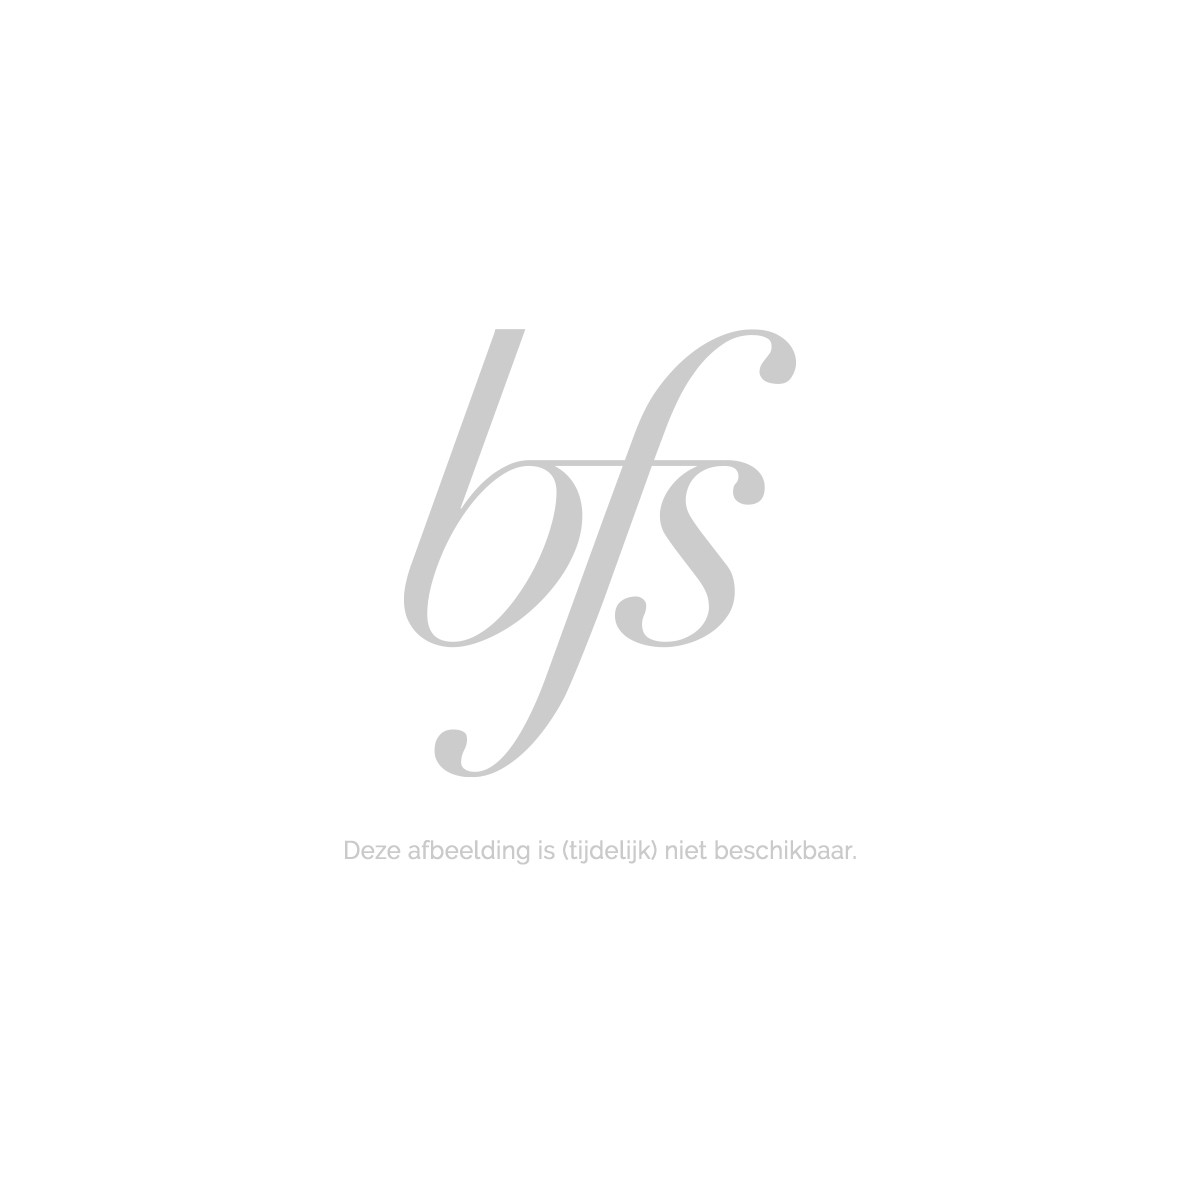 Guerlain Cils DEnfer Maxi Lash So Volume Mascara #01 Noir 8,5 Ml